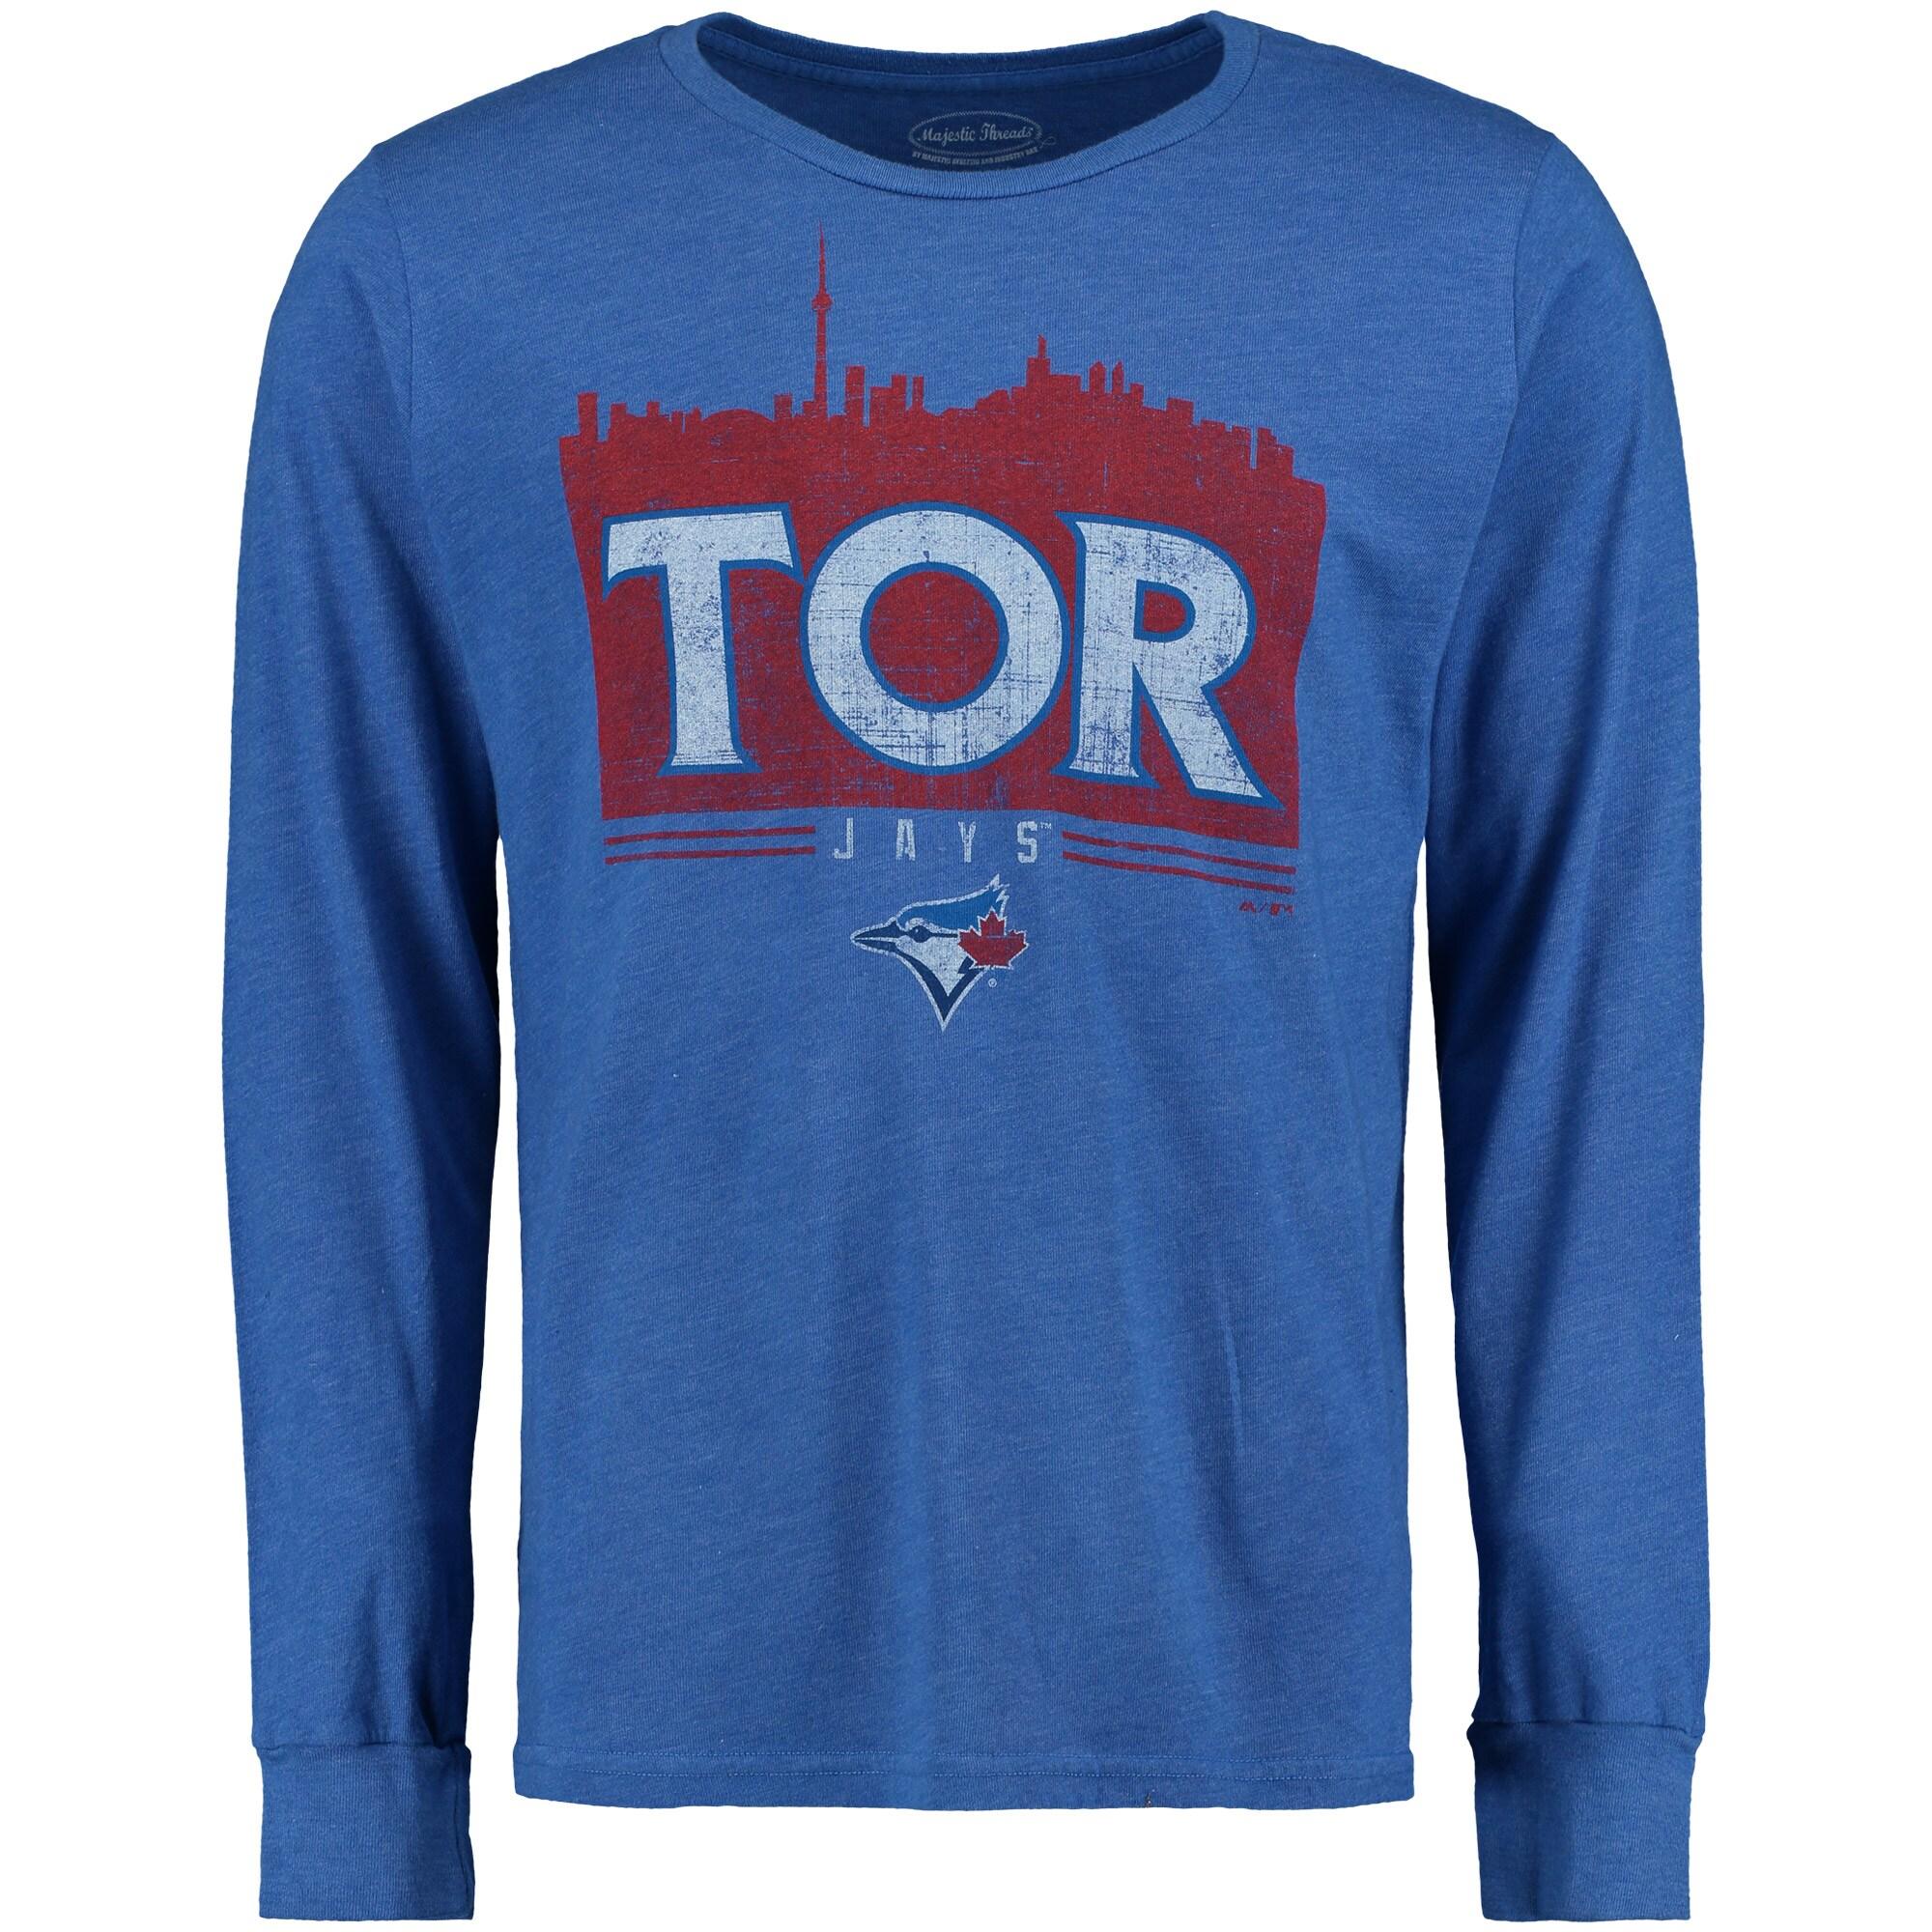 Toronto Blue Jays Majestic Threads Skyline Tri-Blend Long Sleeve T-Shirt - Royal -